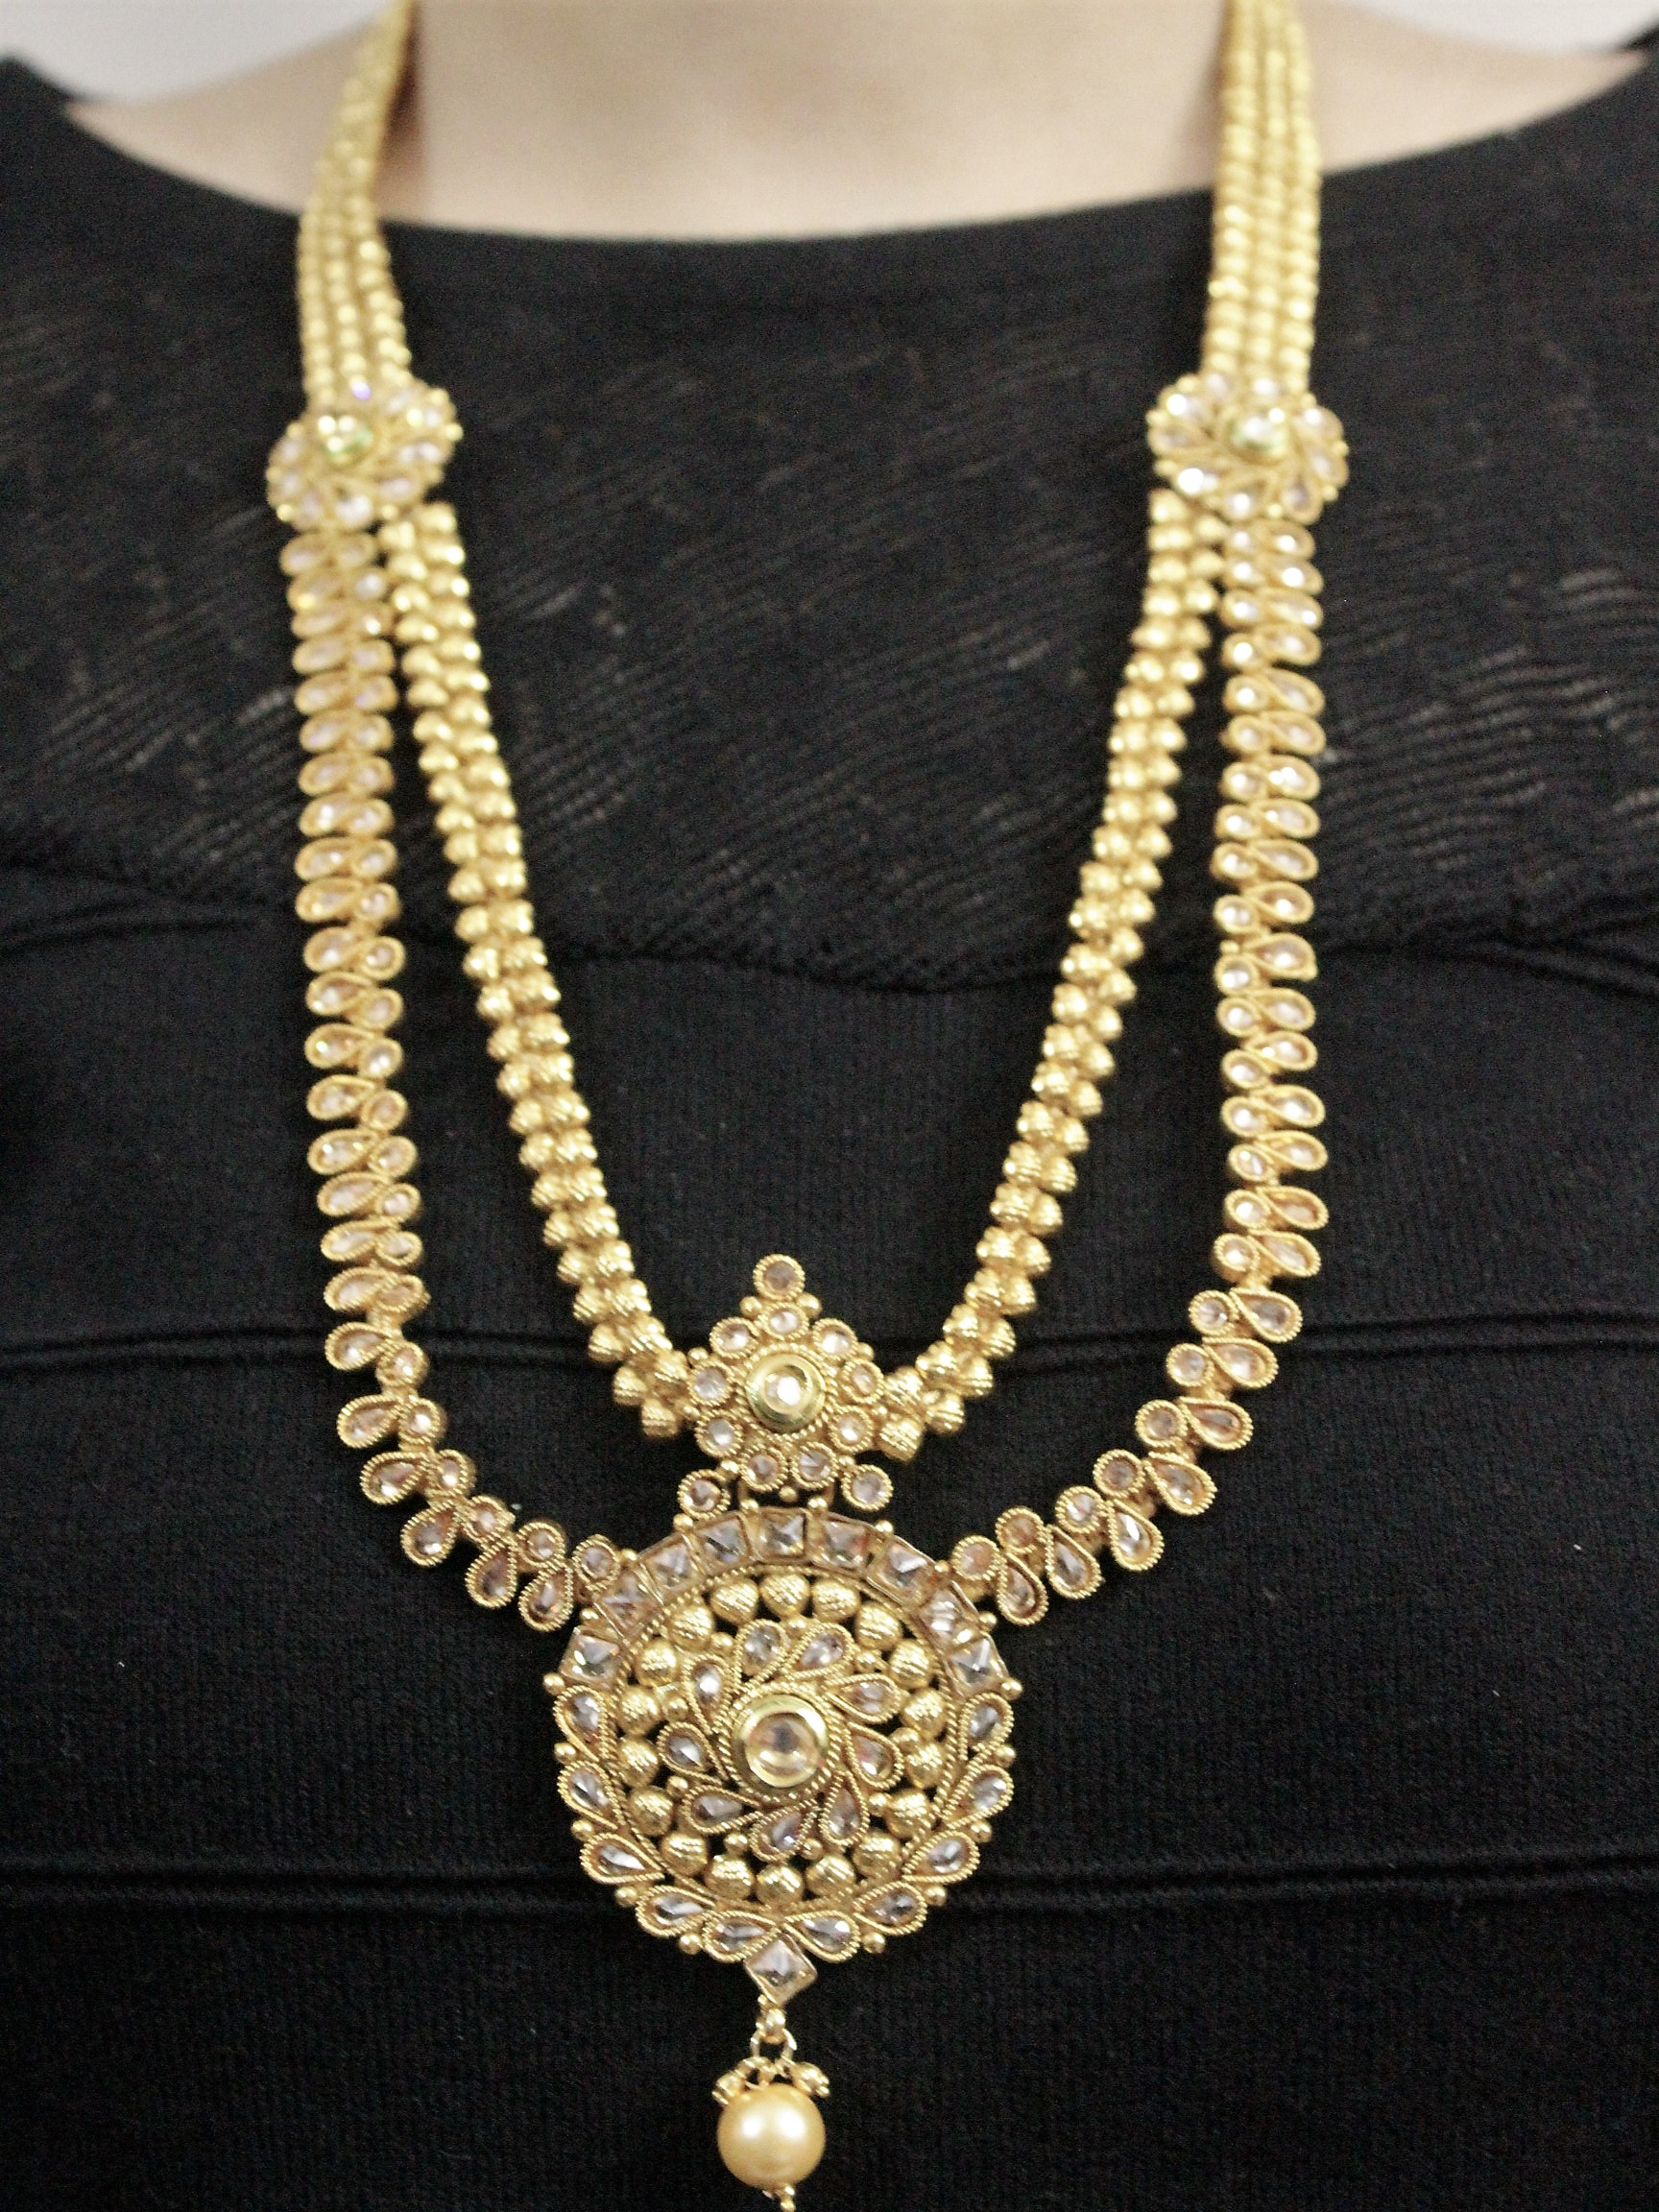 IndiHaute, Long necklace set online in kalhapur , long necklace set online shopping in kalhapur , long necklace set for shopping in kalhapur , long necklace set for set price in kalhapur ,